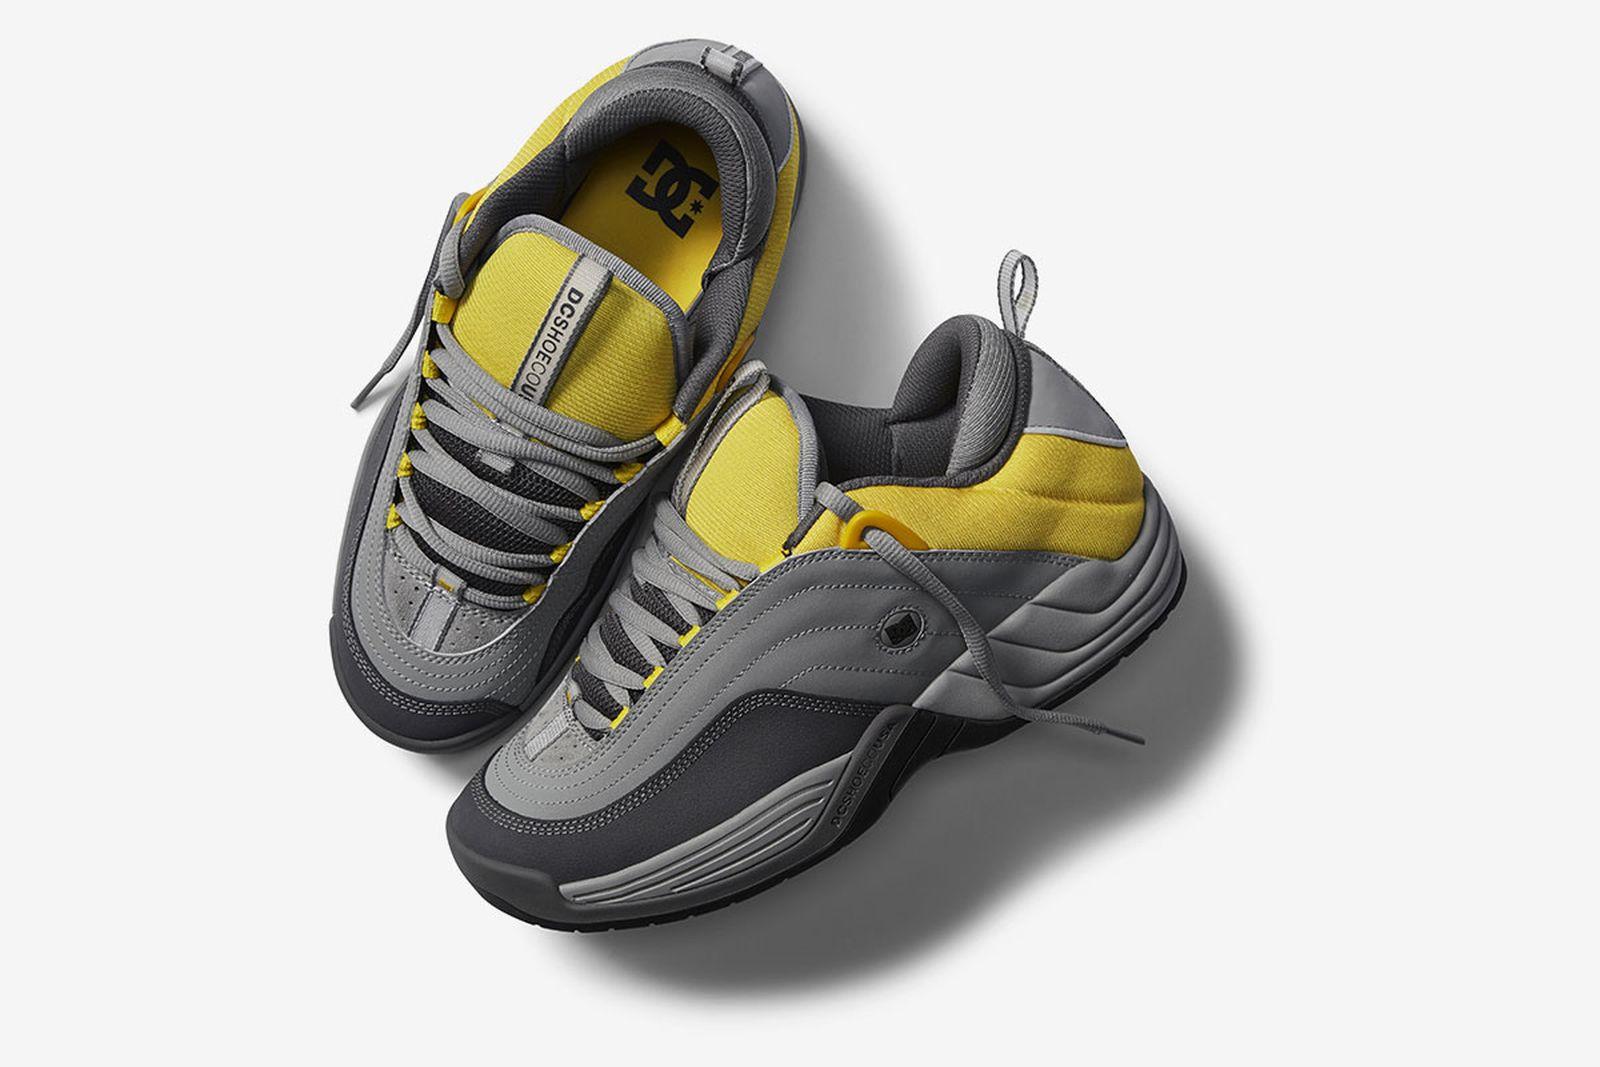 dc skate shoes grey yellow